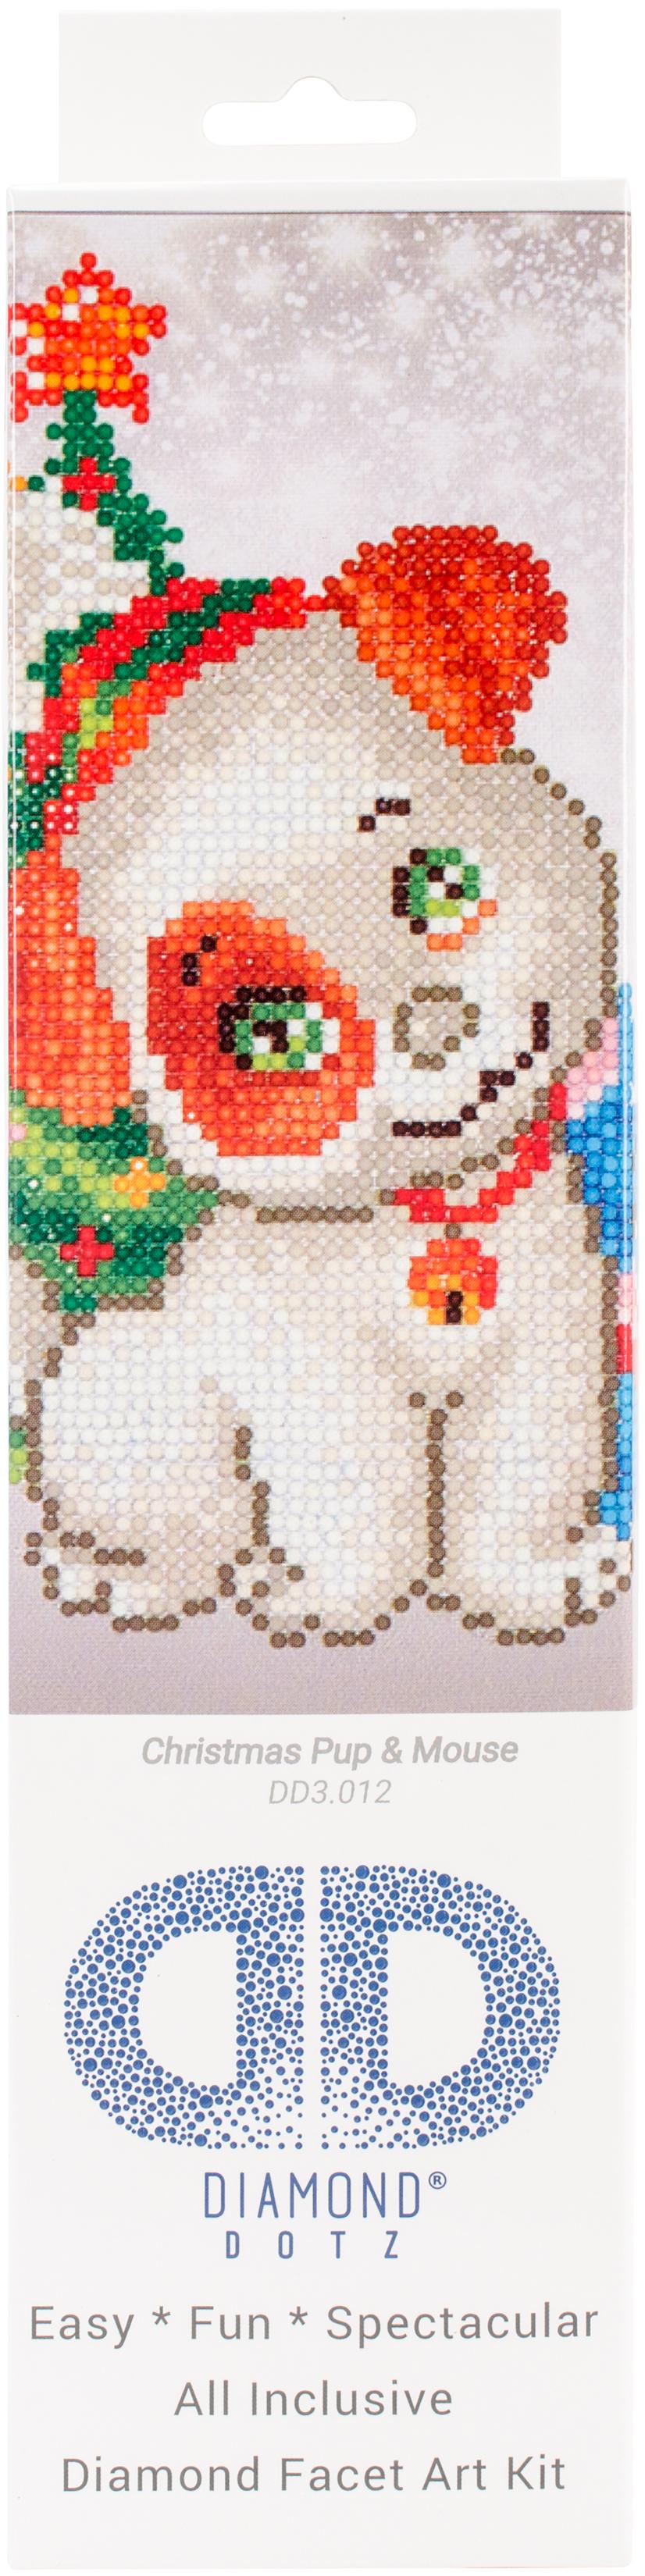 Diamond Dotz Diamond Embroidery Facet Art Kit 11X11.75-Christmas Pup & Mouse